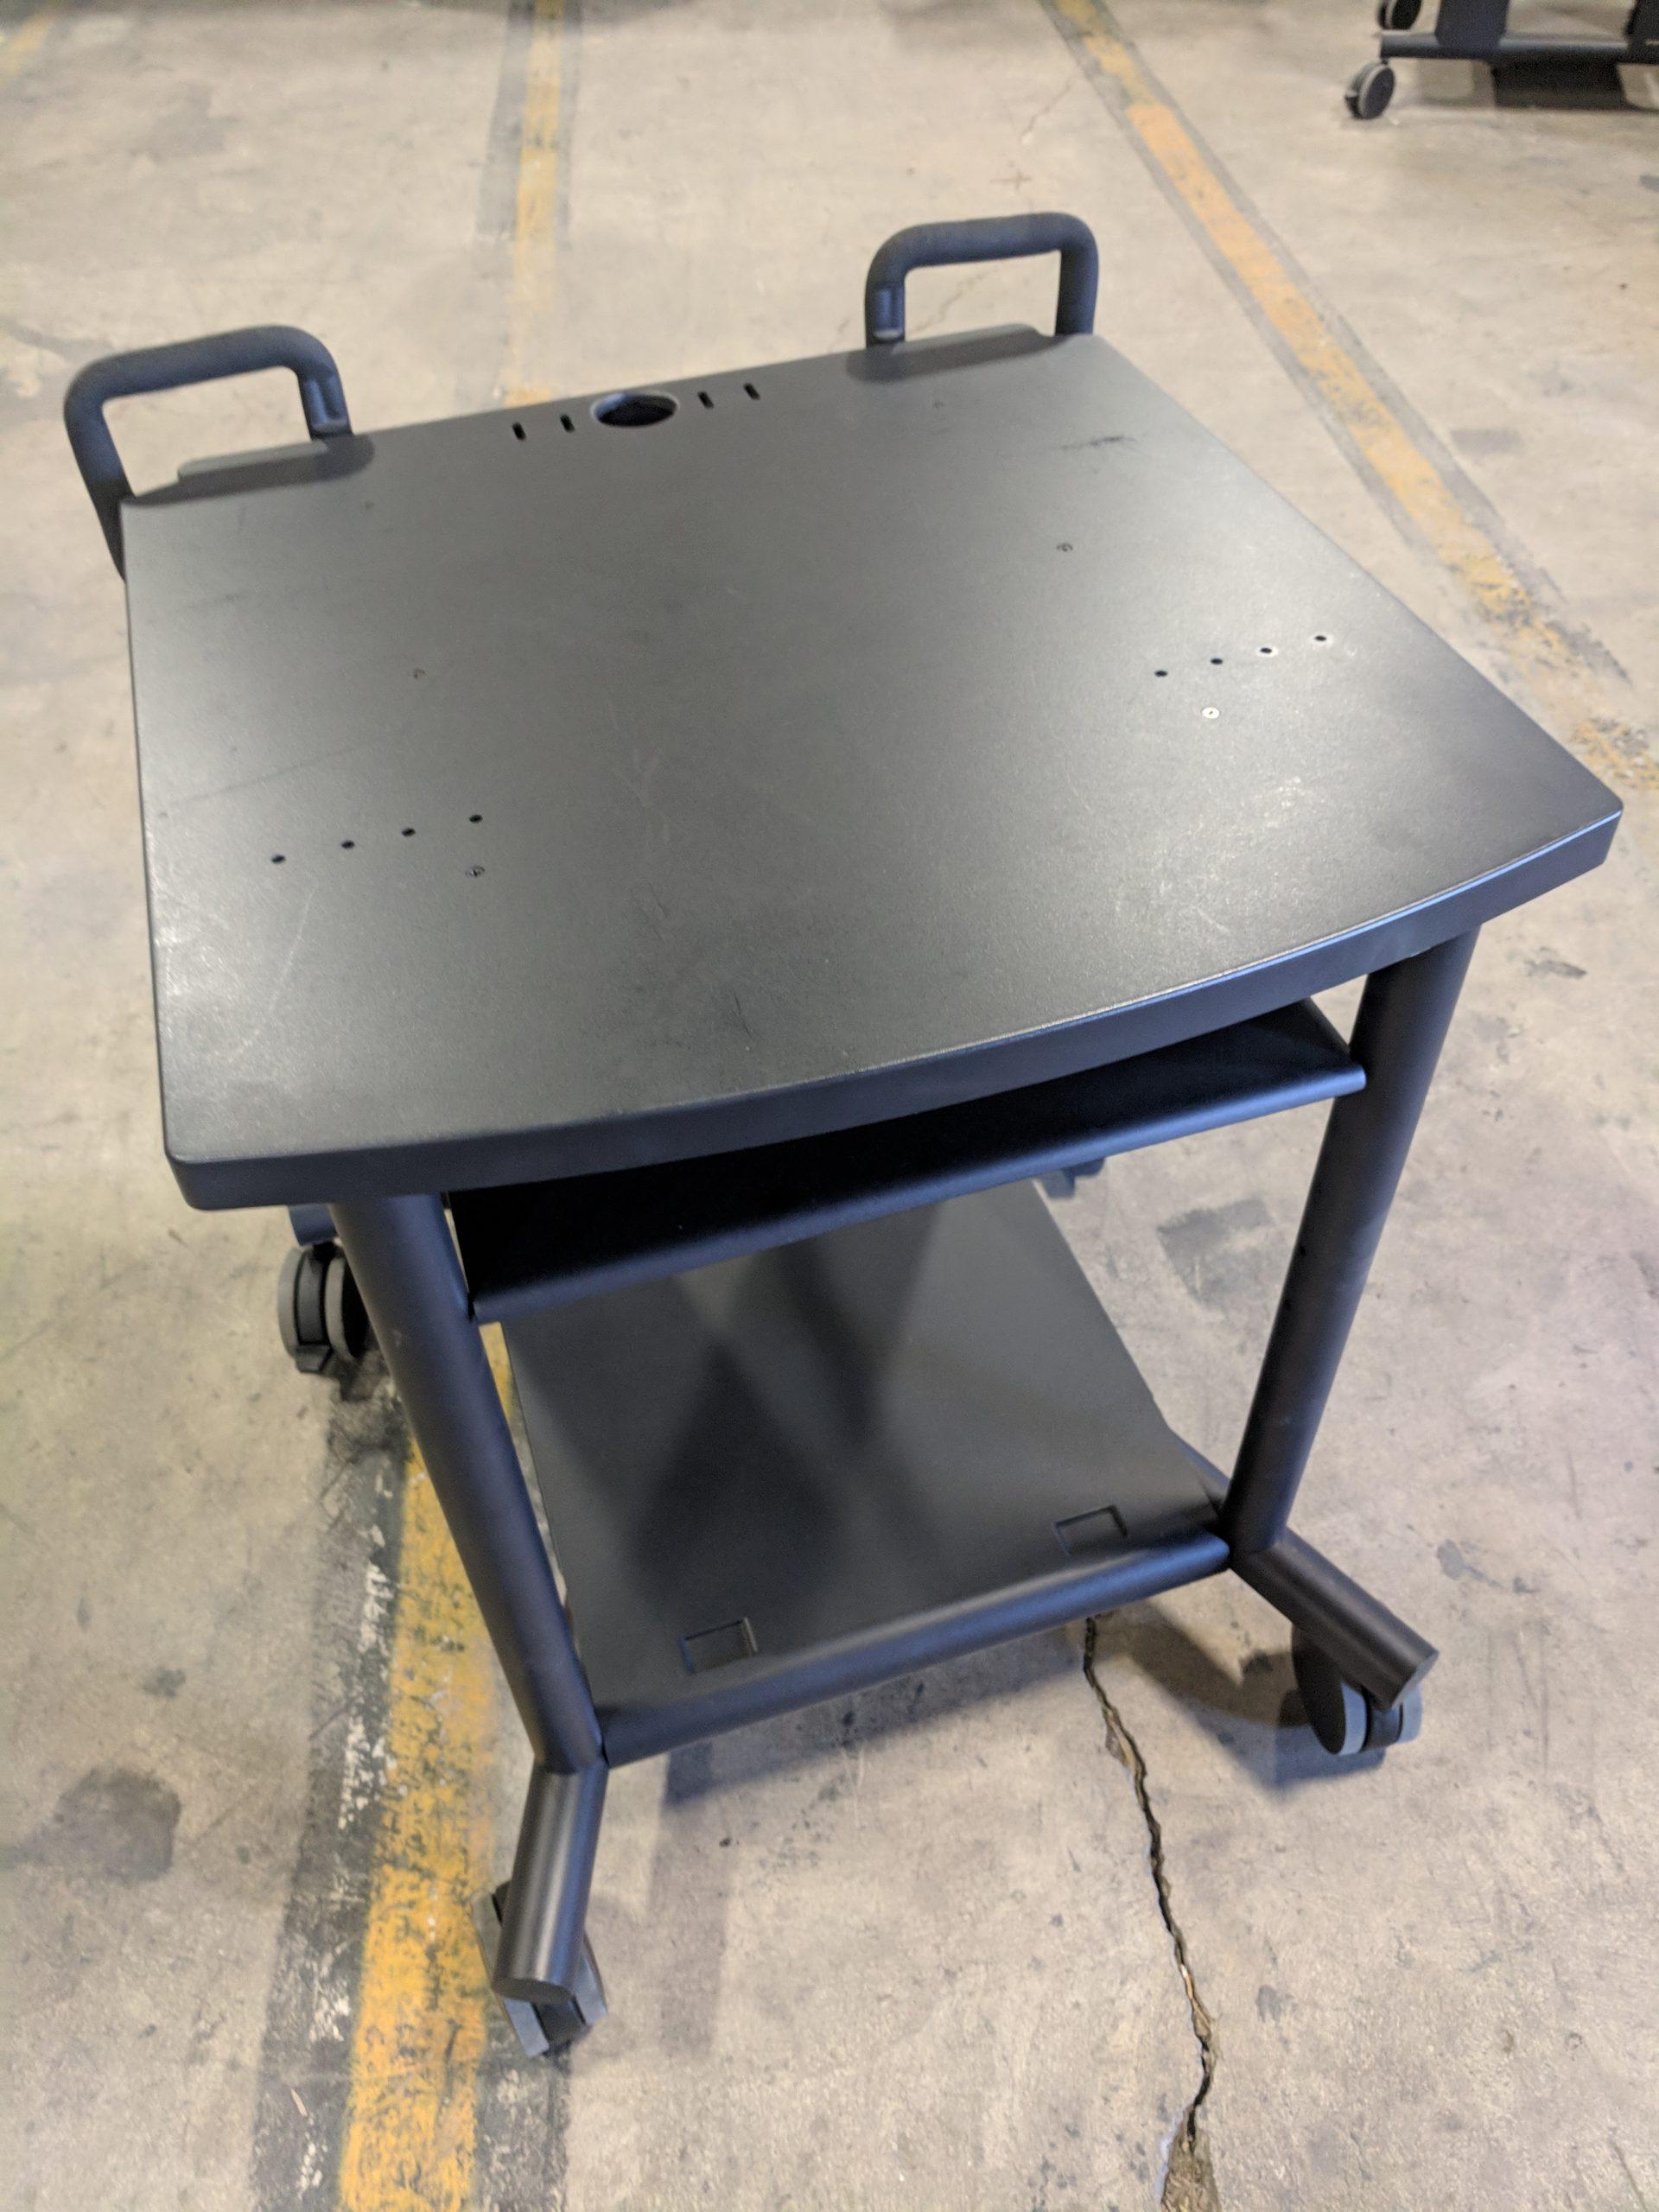 COMPUTER CART, BLACK METAL FRAME W/(2) SHELVES, 31Wx28Dx31H